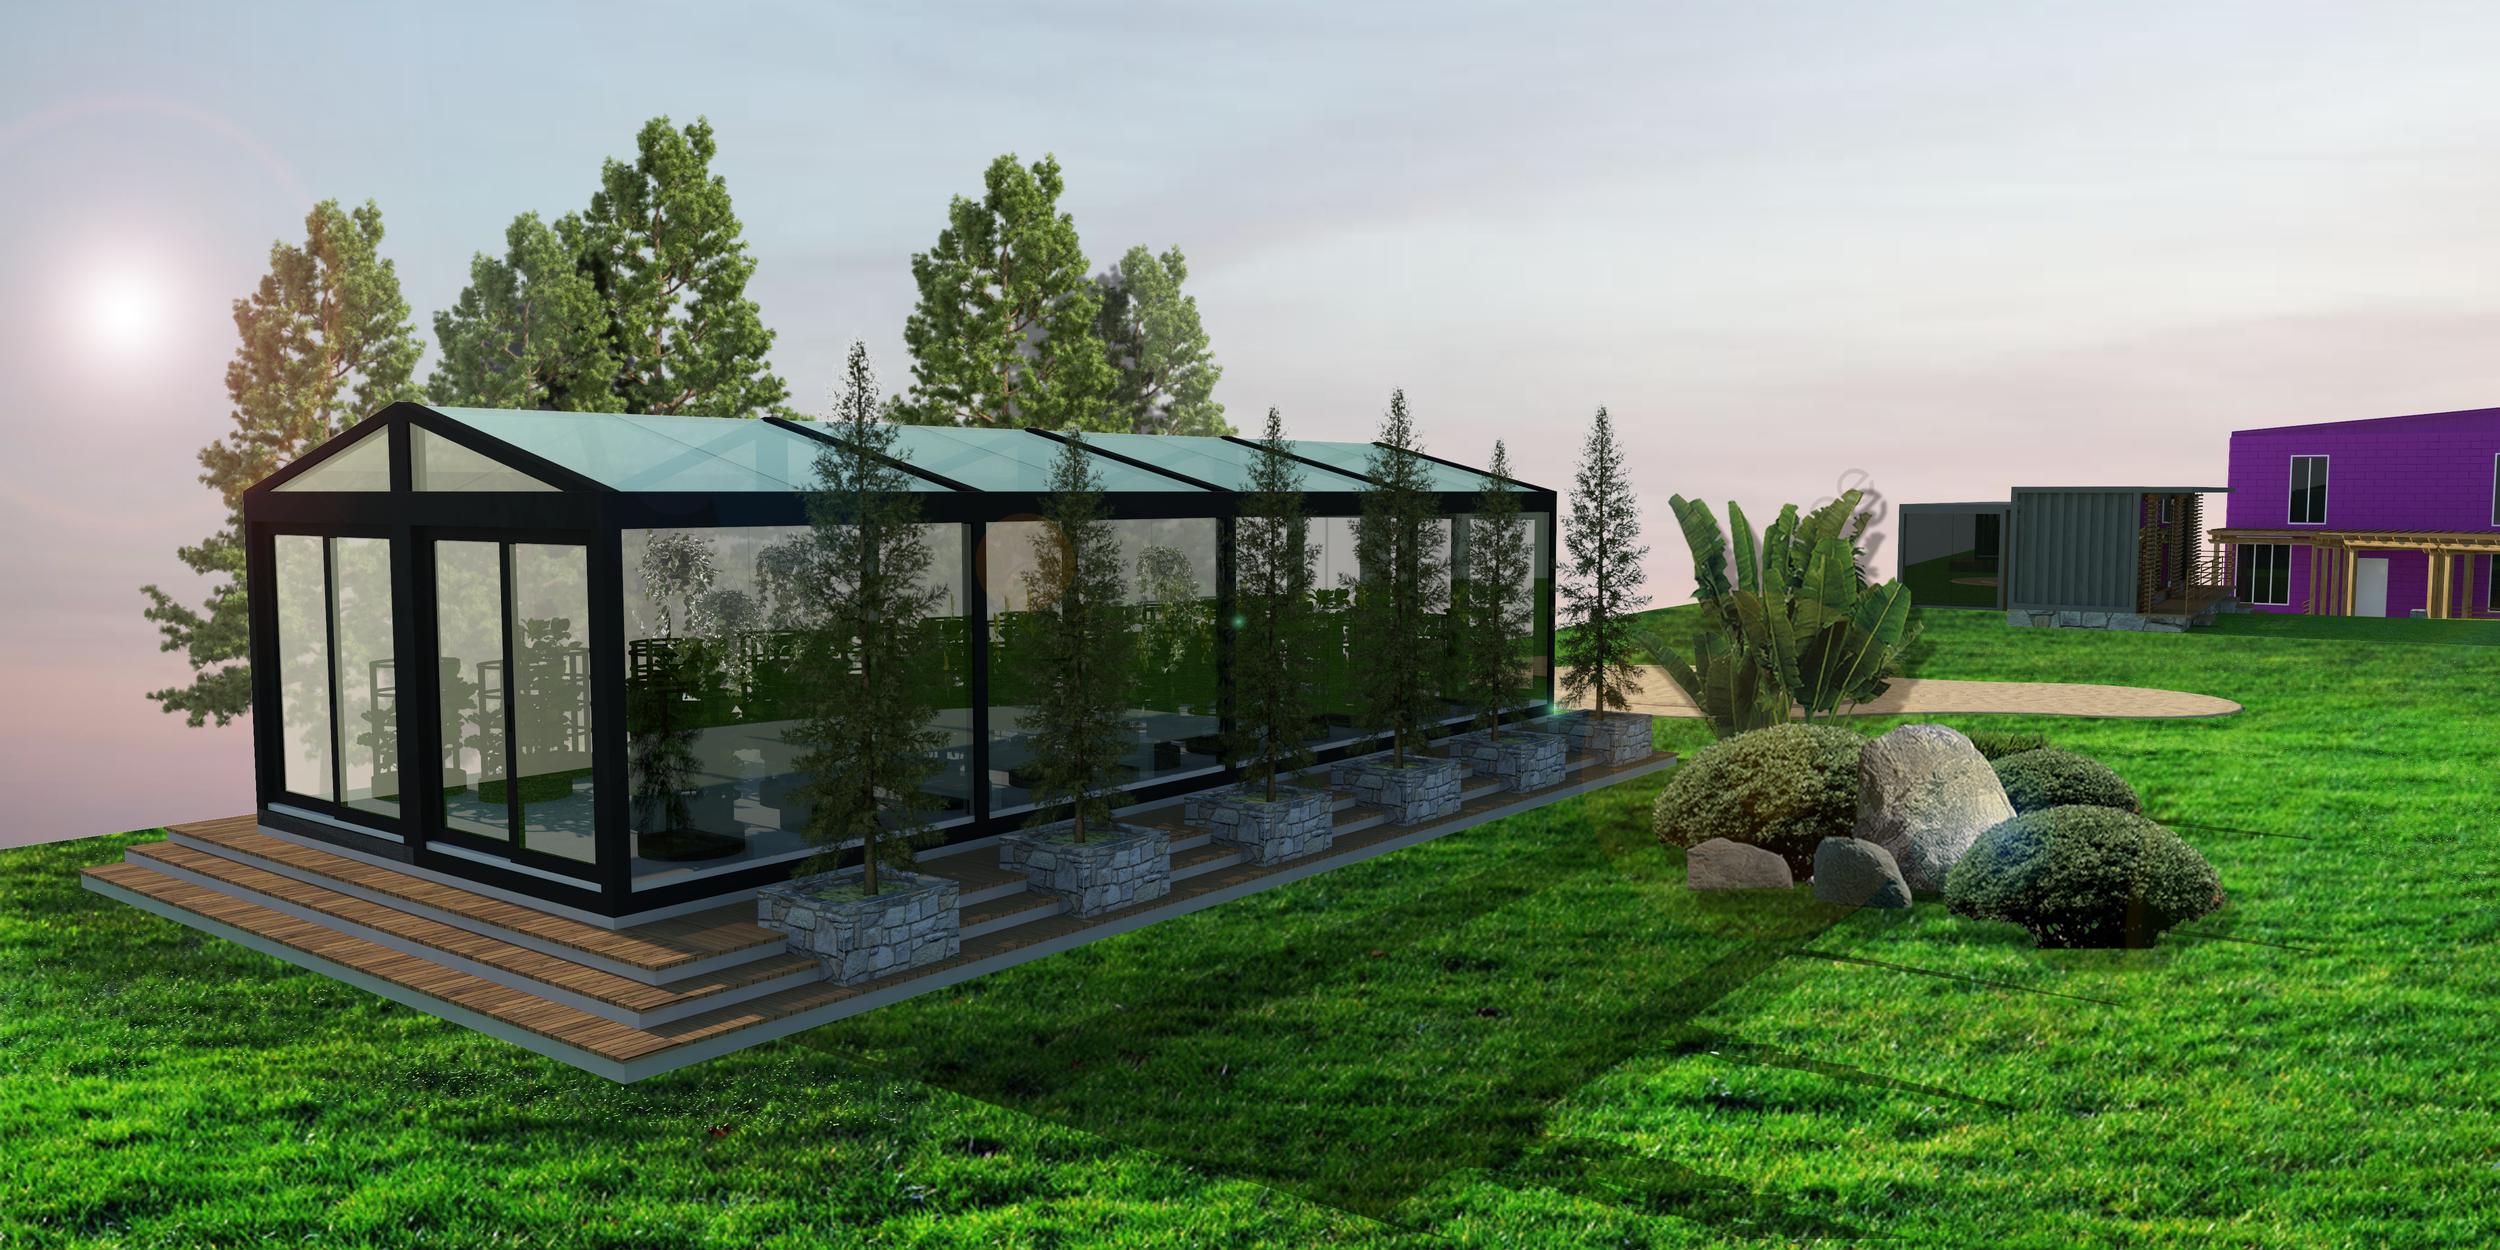 Huey's Greenhouse - Garden Towers